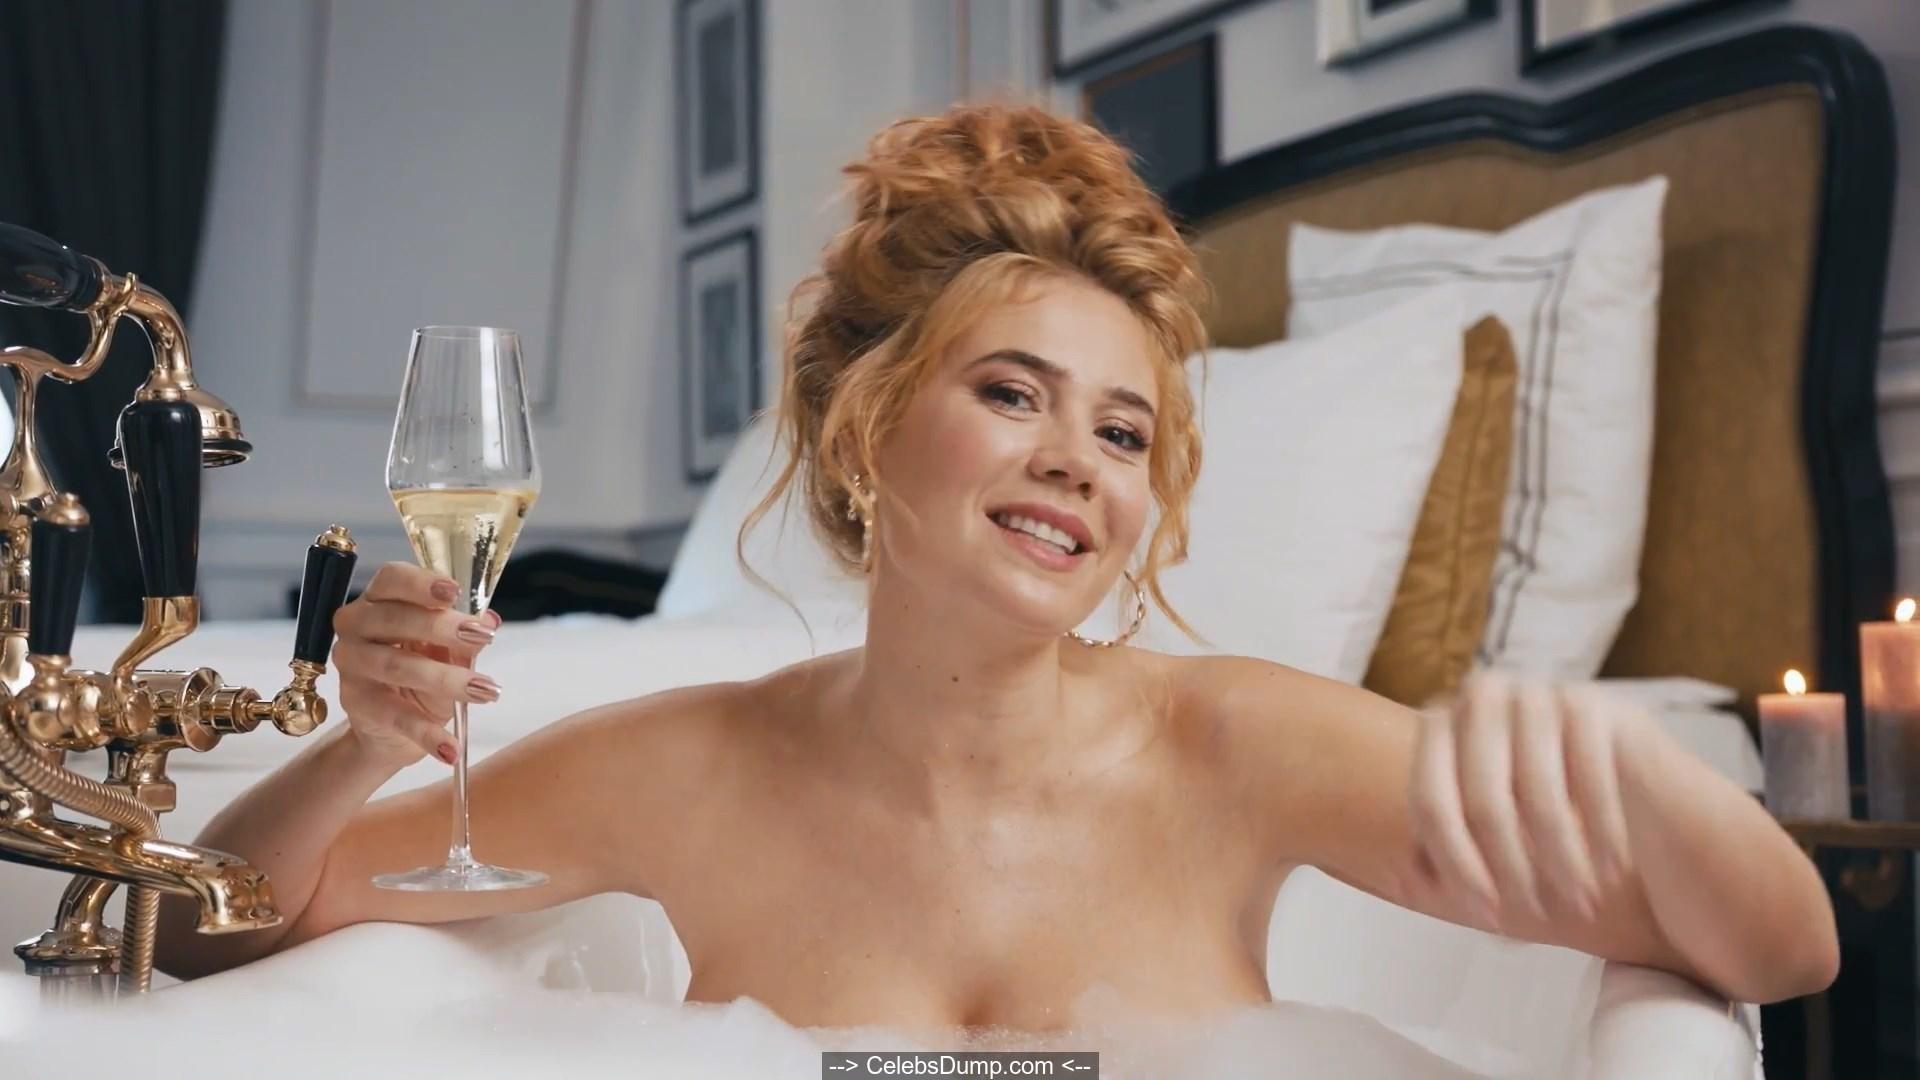 Nude pics rojinski palina Palina Rojinski